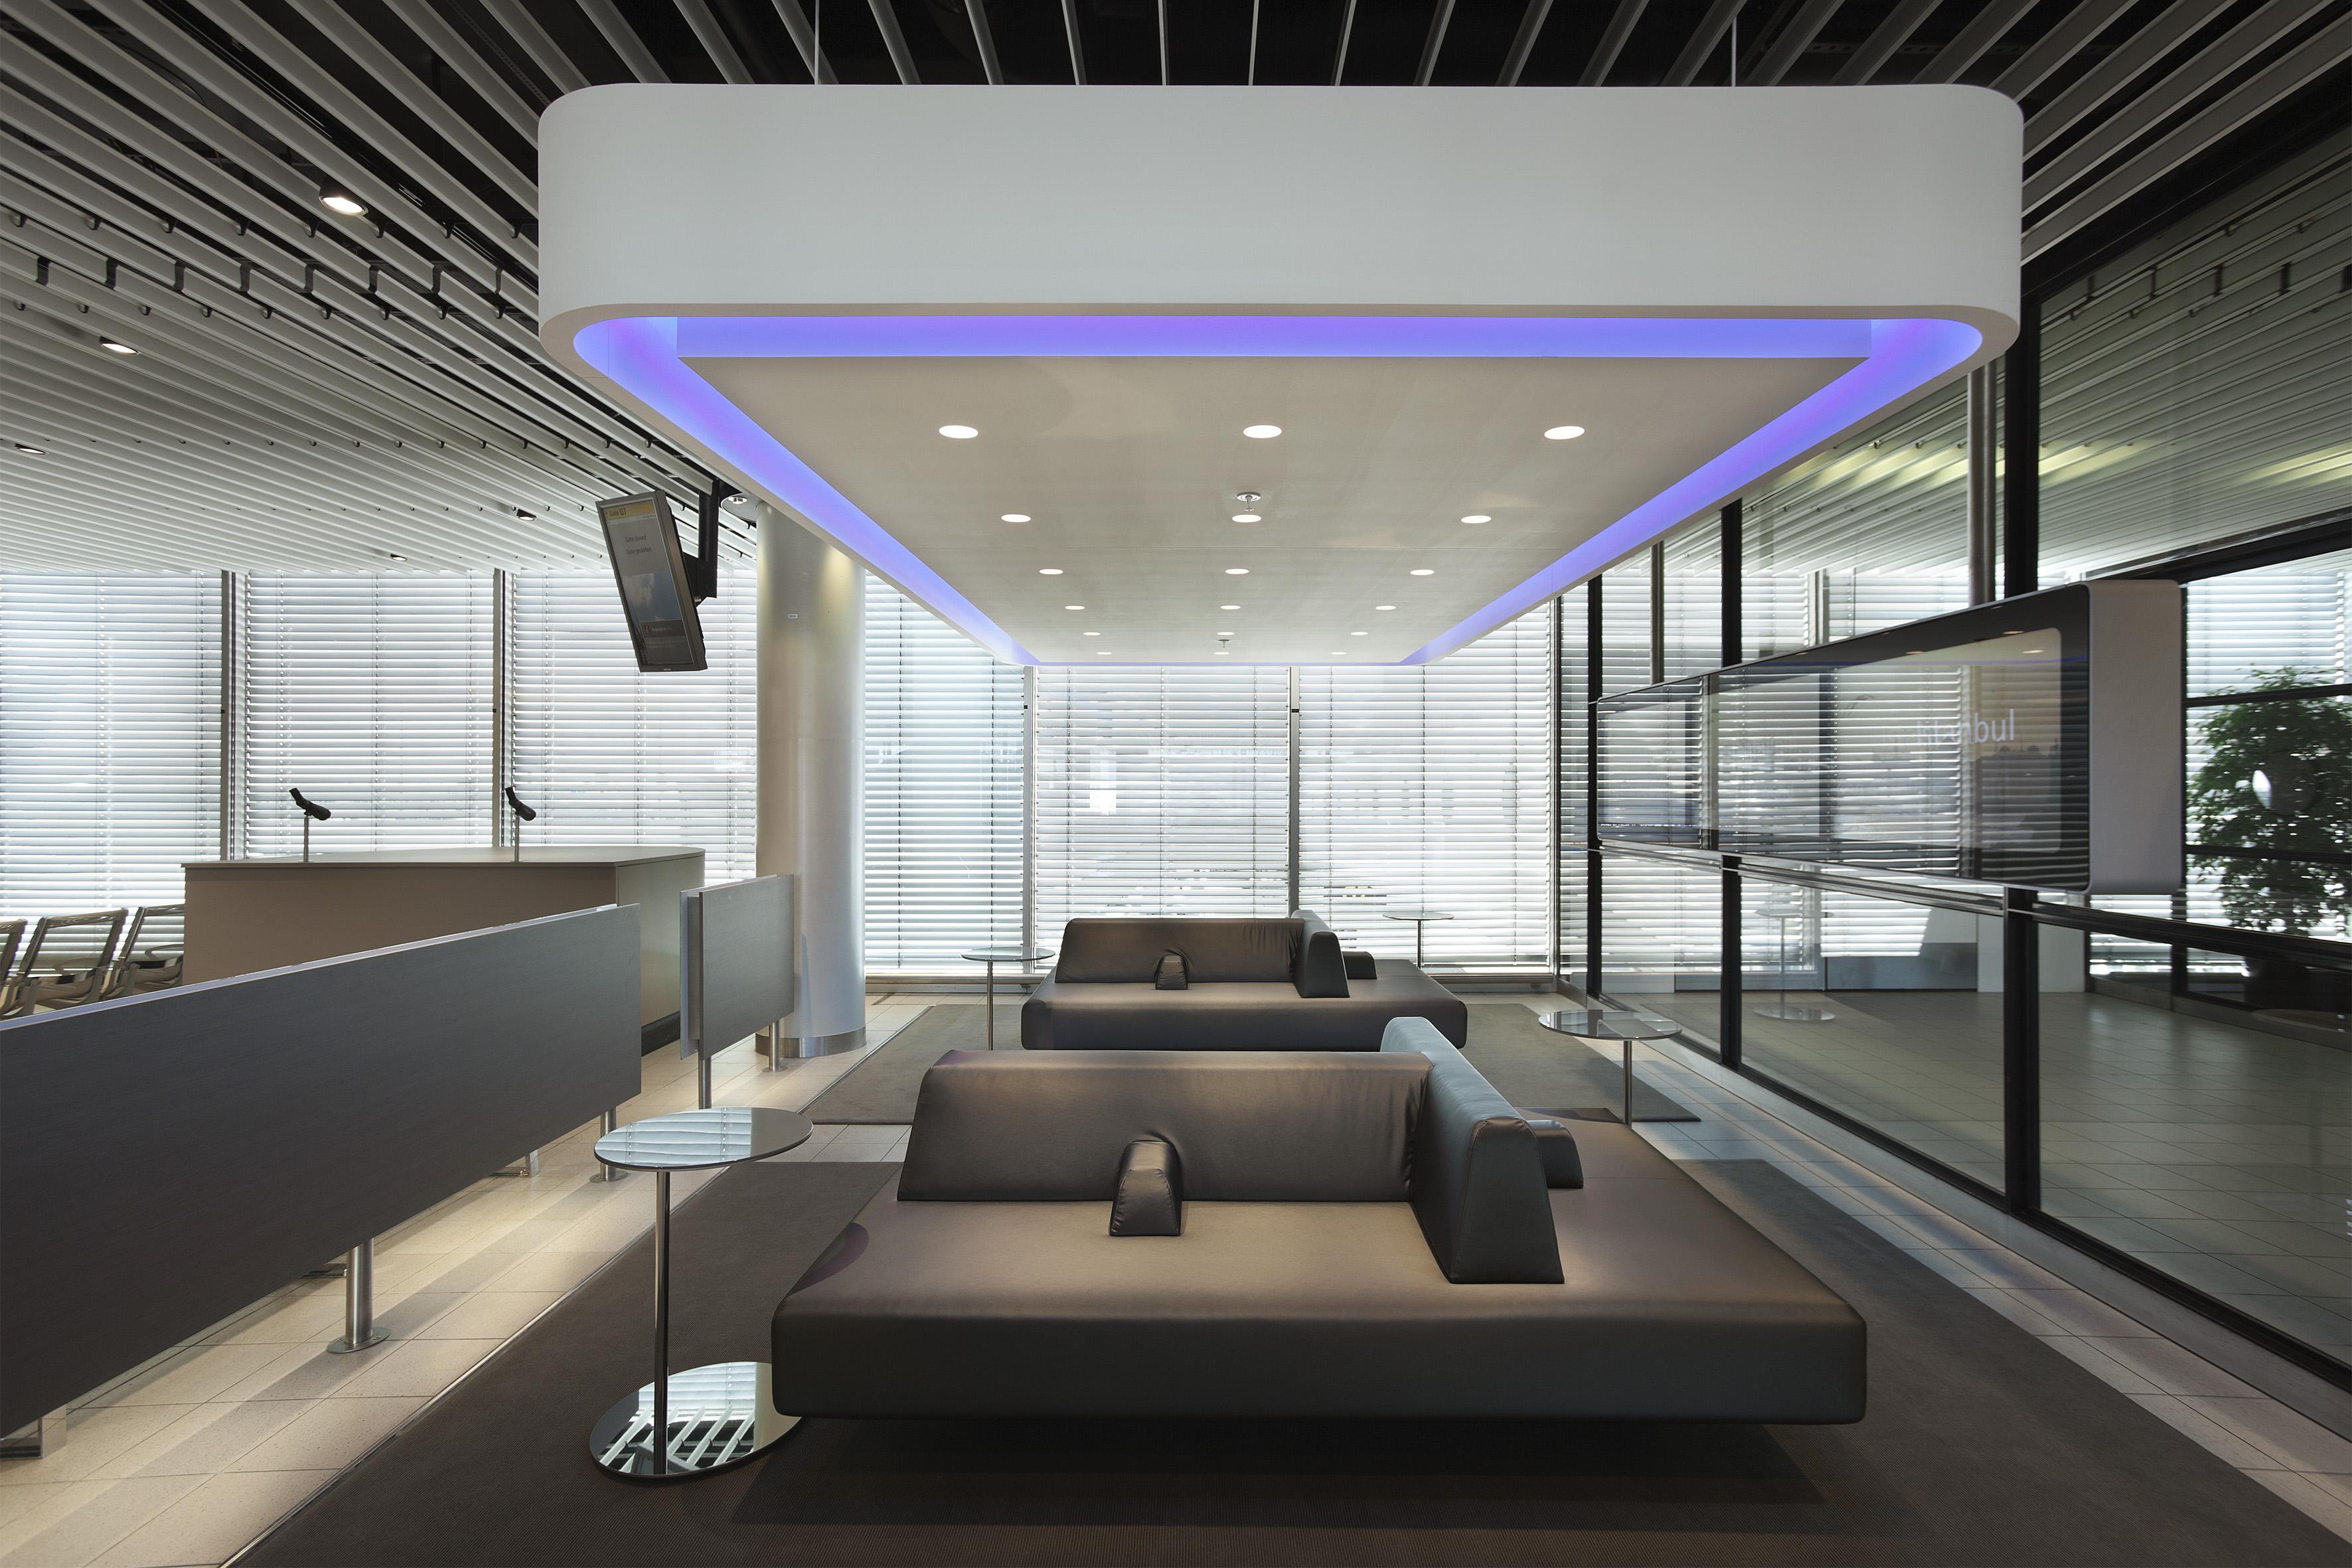 Interior design in a small waiting area joy studio for Interior lighting design standards